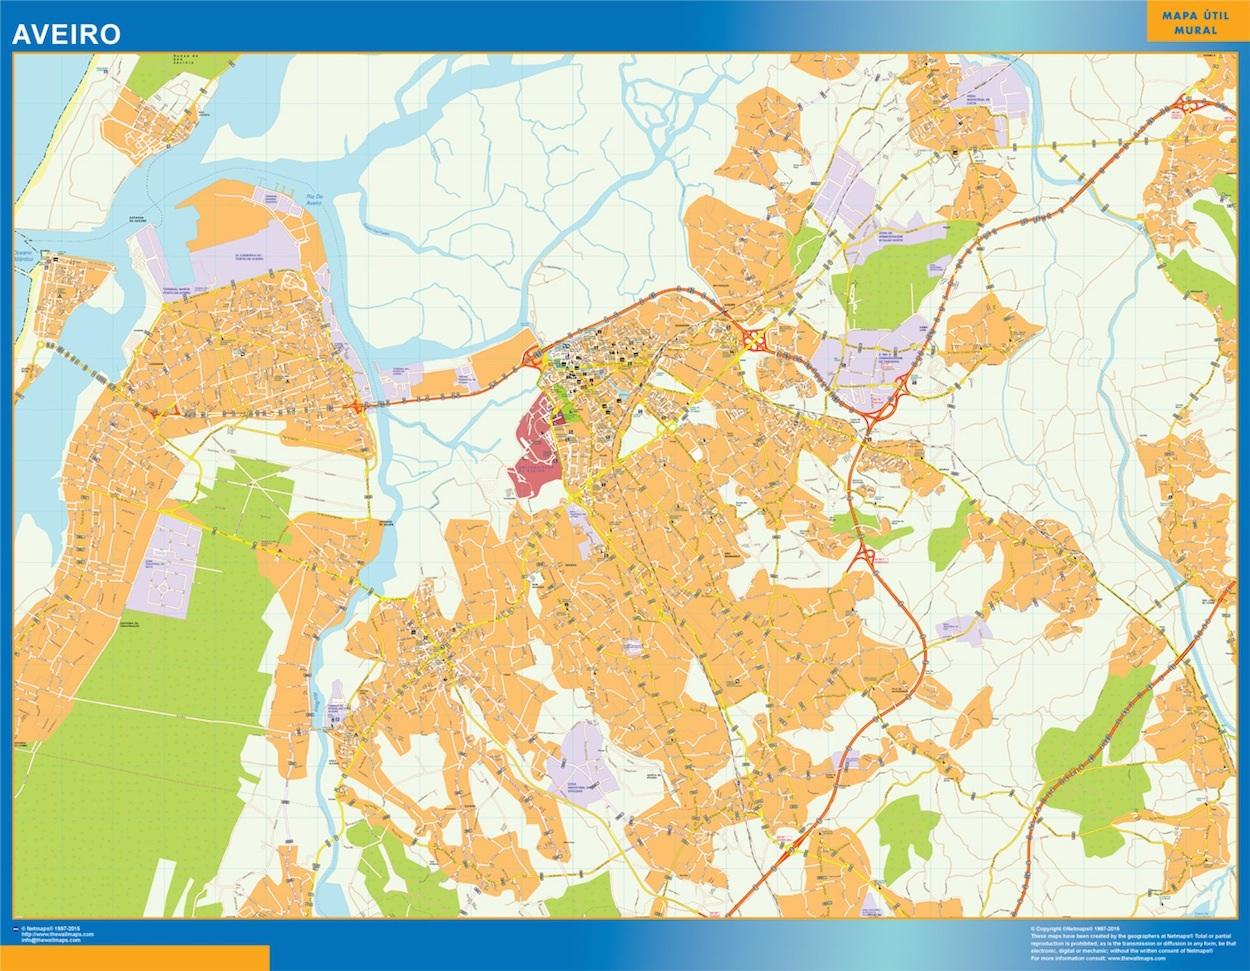 Mapa Aveiro en Portugal plastificado gigante